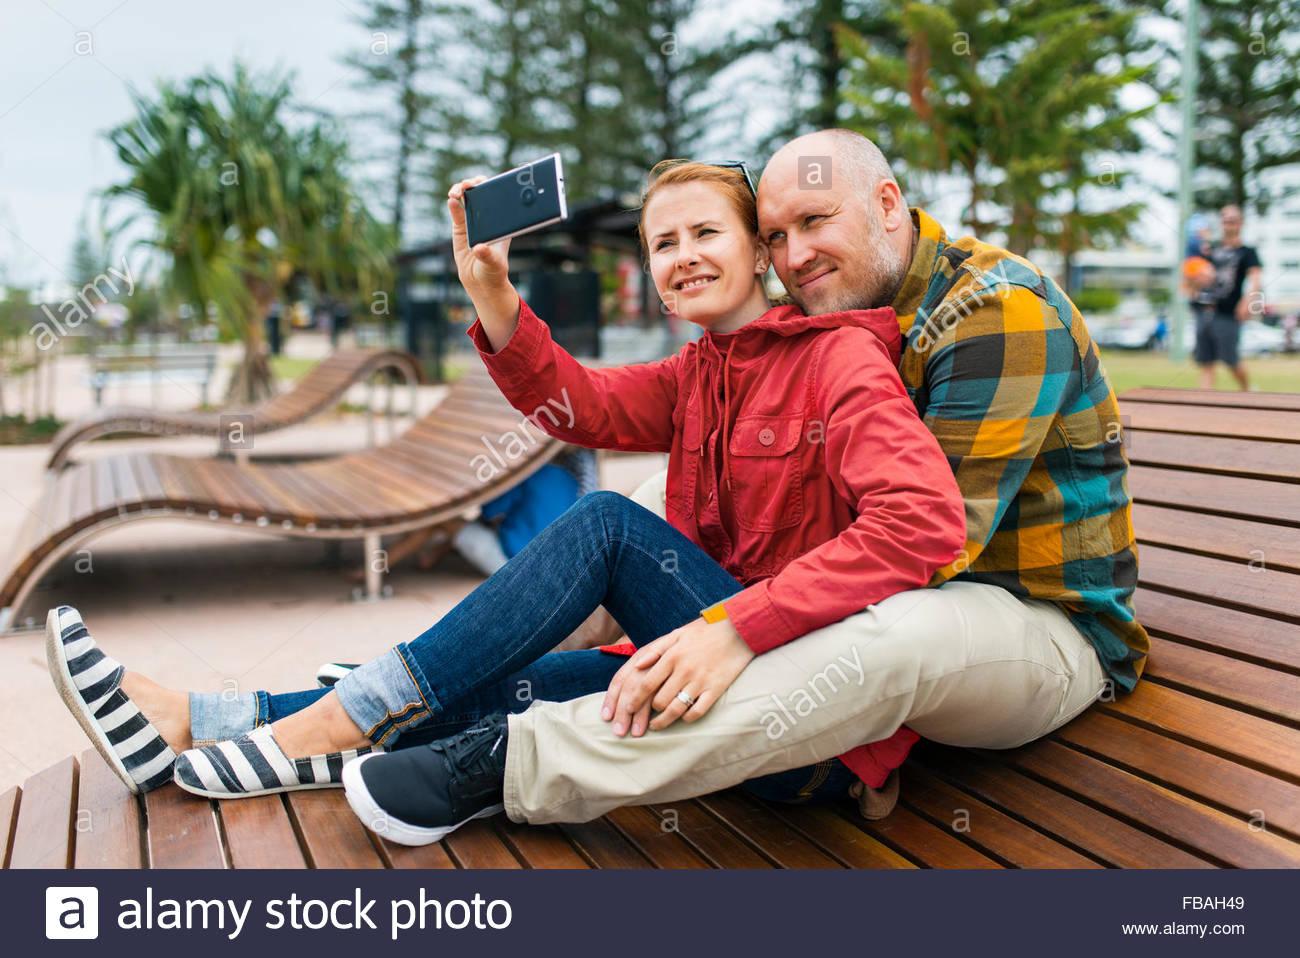 Australia, Queensland, Mid-adult couple taking selfie on bench in park Stock Photo